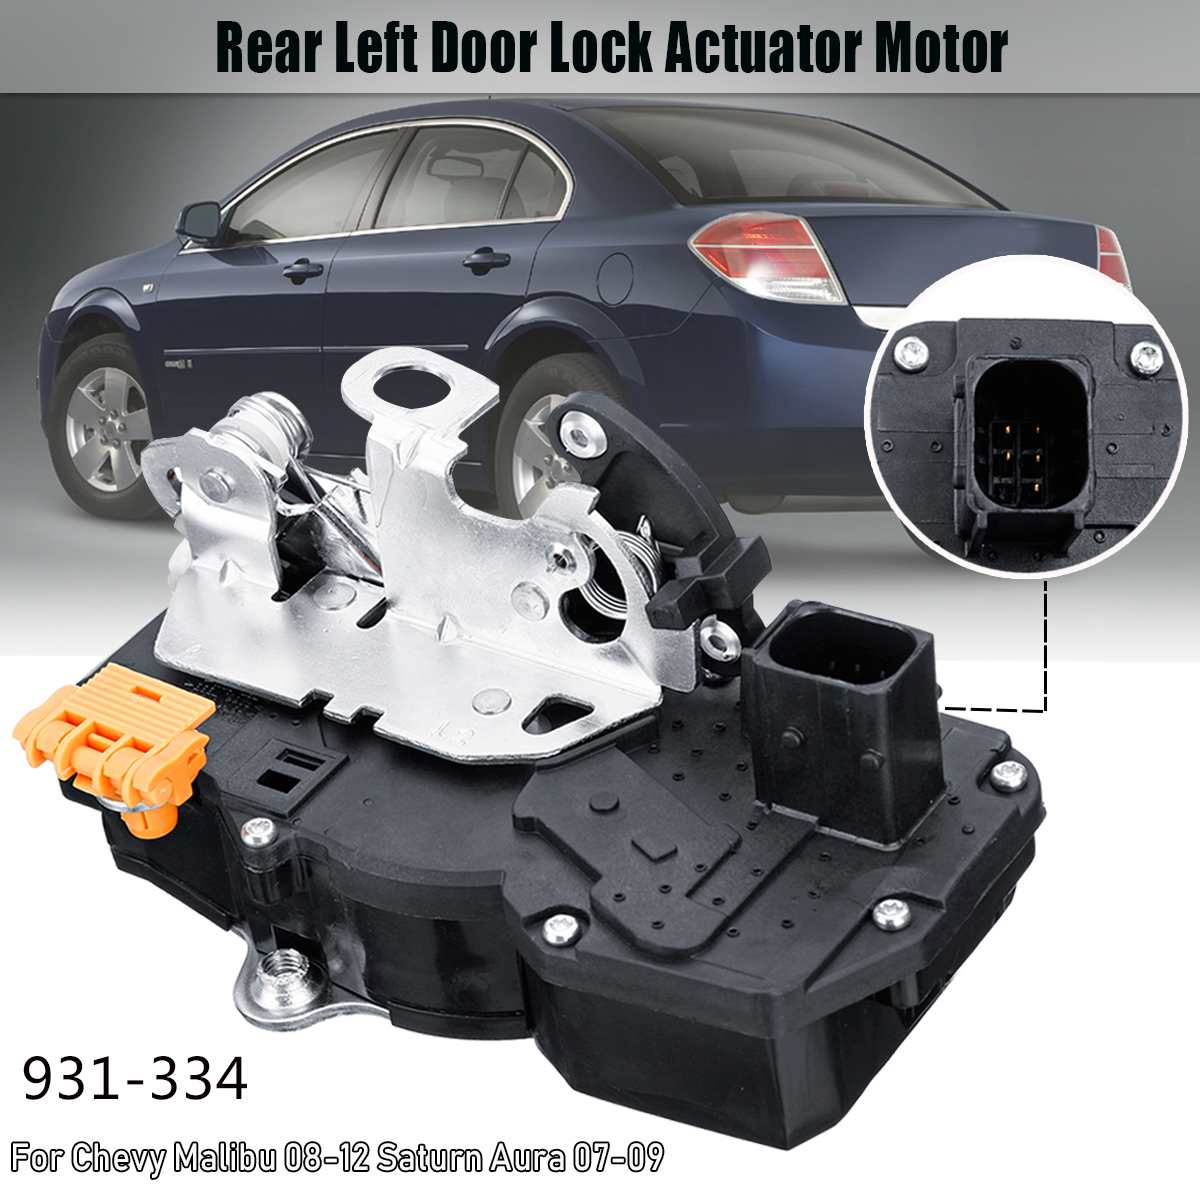 931334 Door Lock Actuator Motor Rear Left For Saturn Aura Chevrolet Malibu 08-12